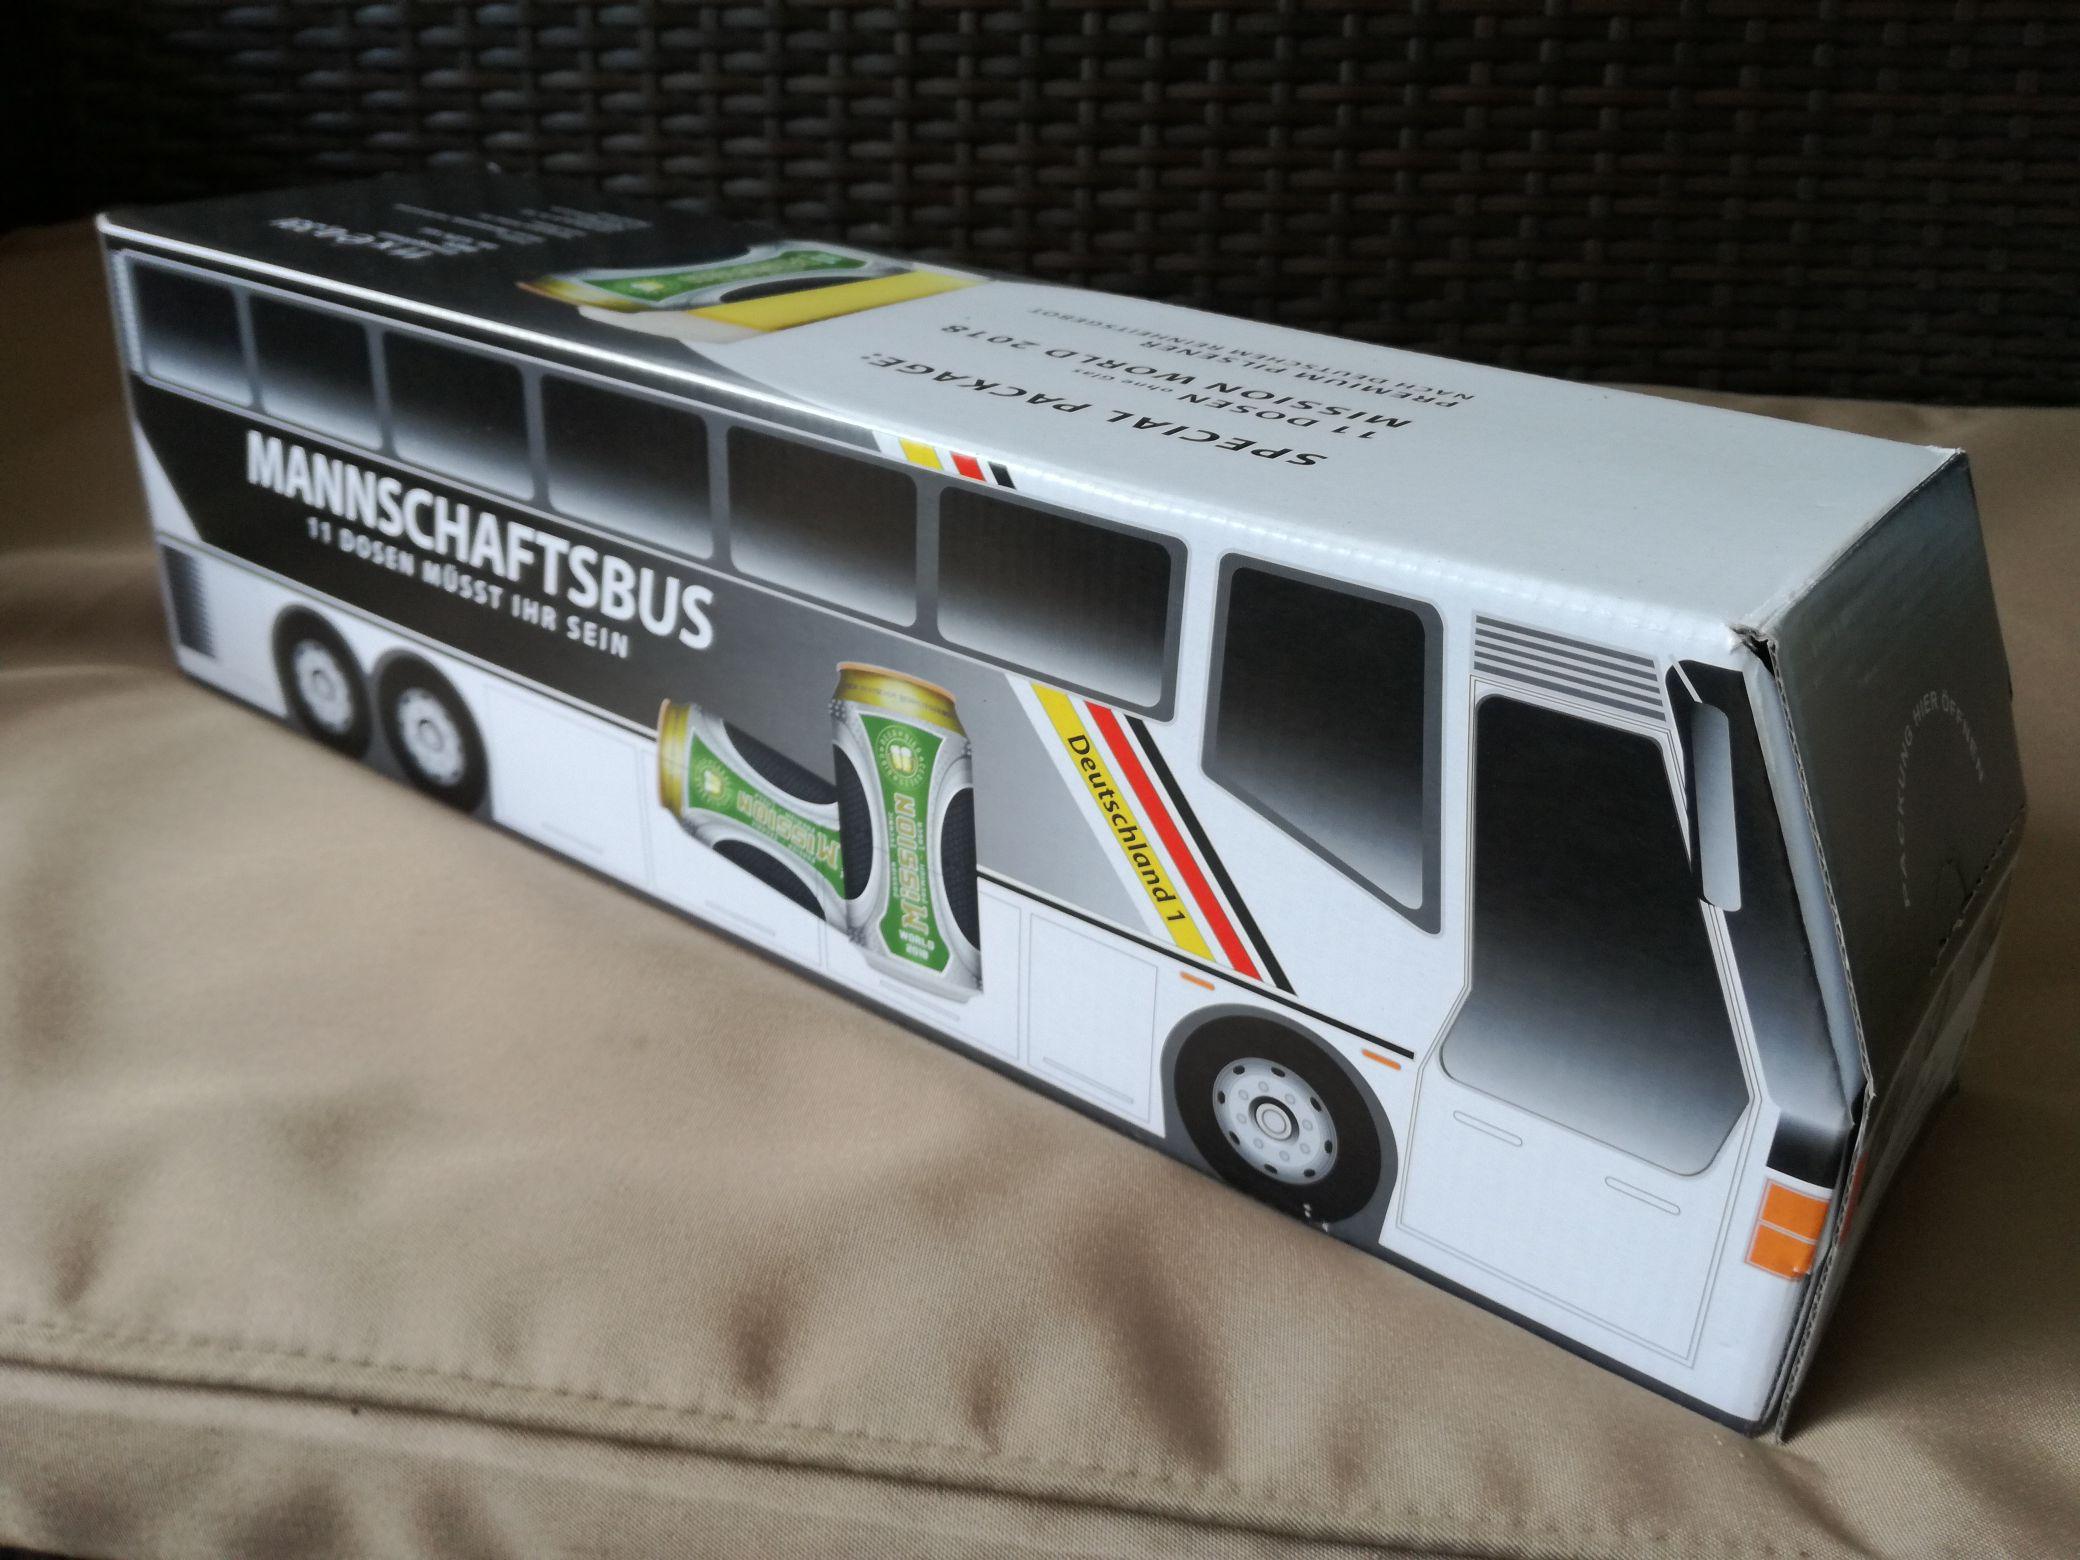 (LIDL bundesweit) Aktion - DFB Tourbus 11x0,33l Premiumbier